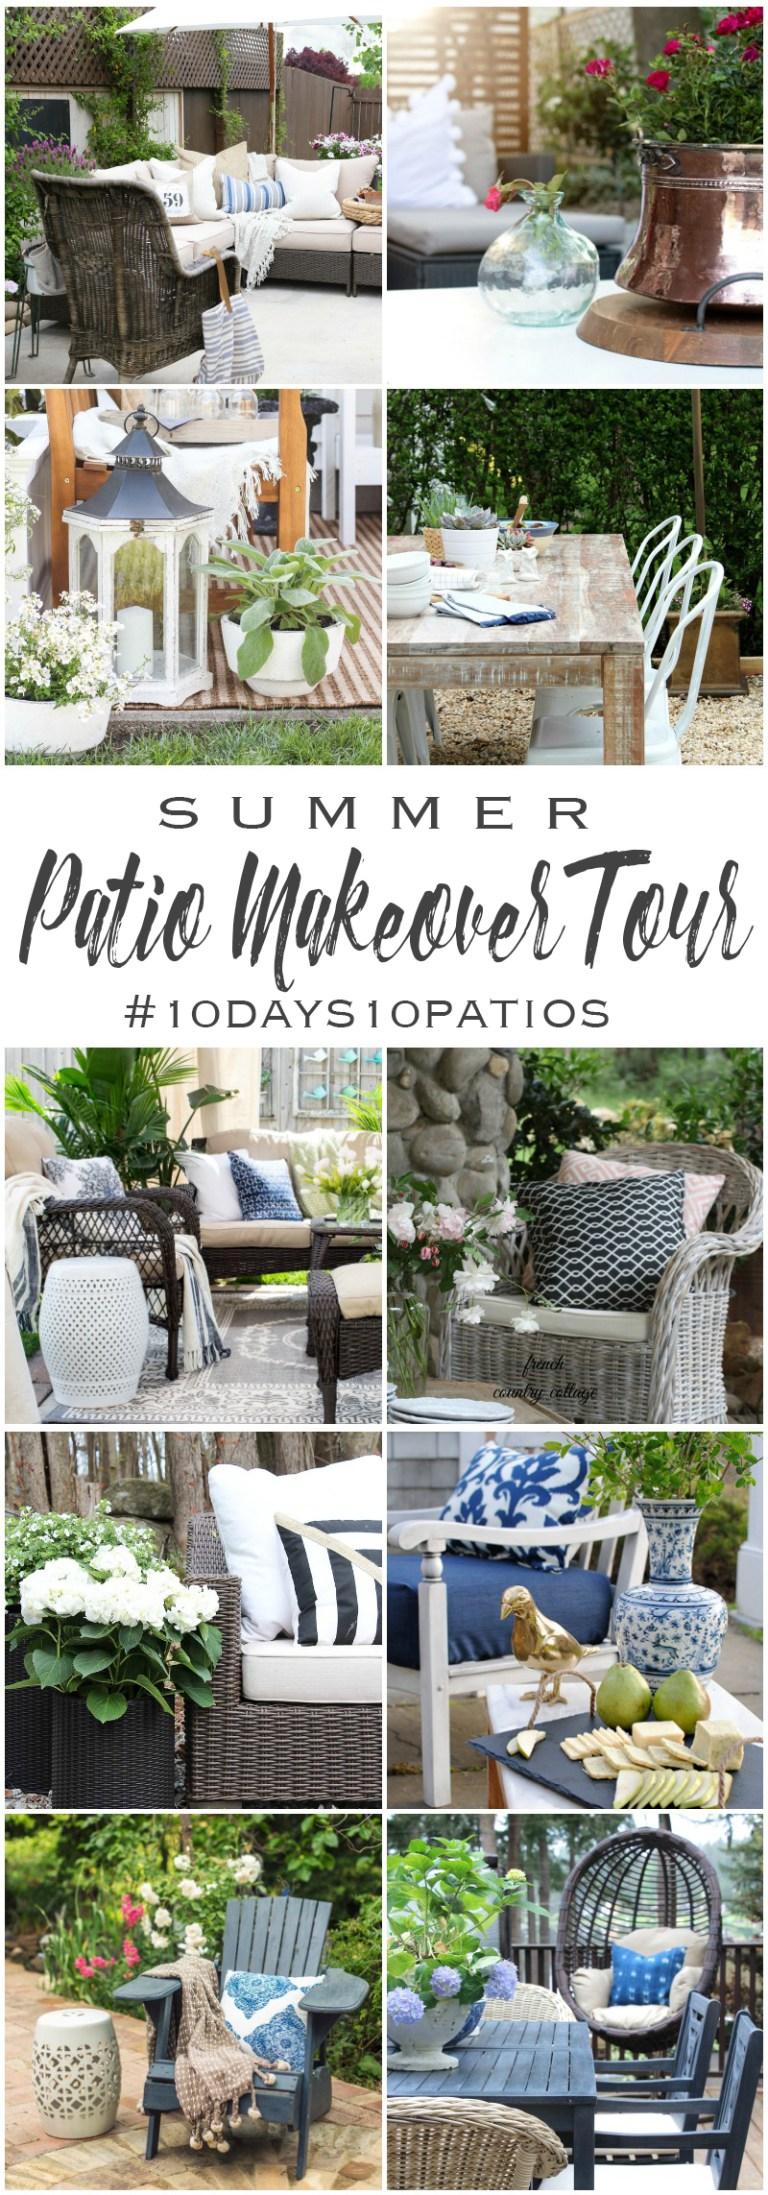 Summer-Patio-Makeover-Tour